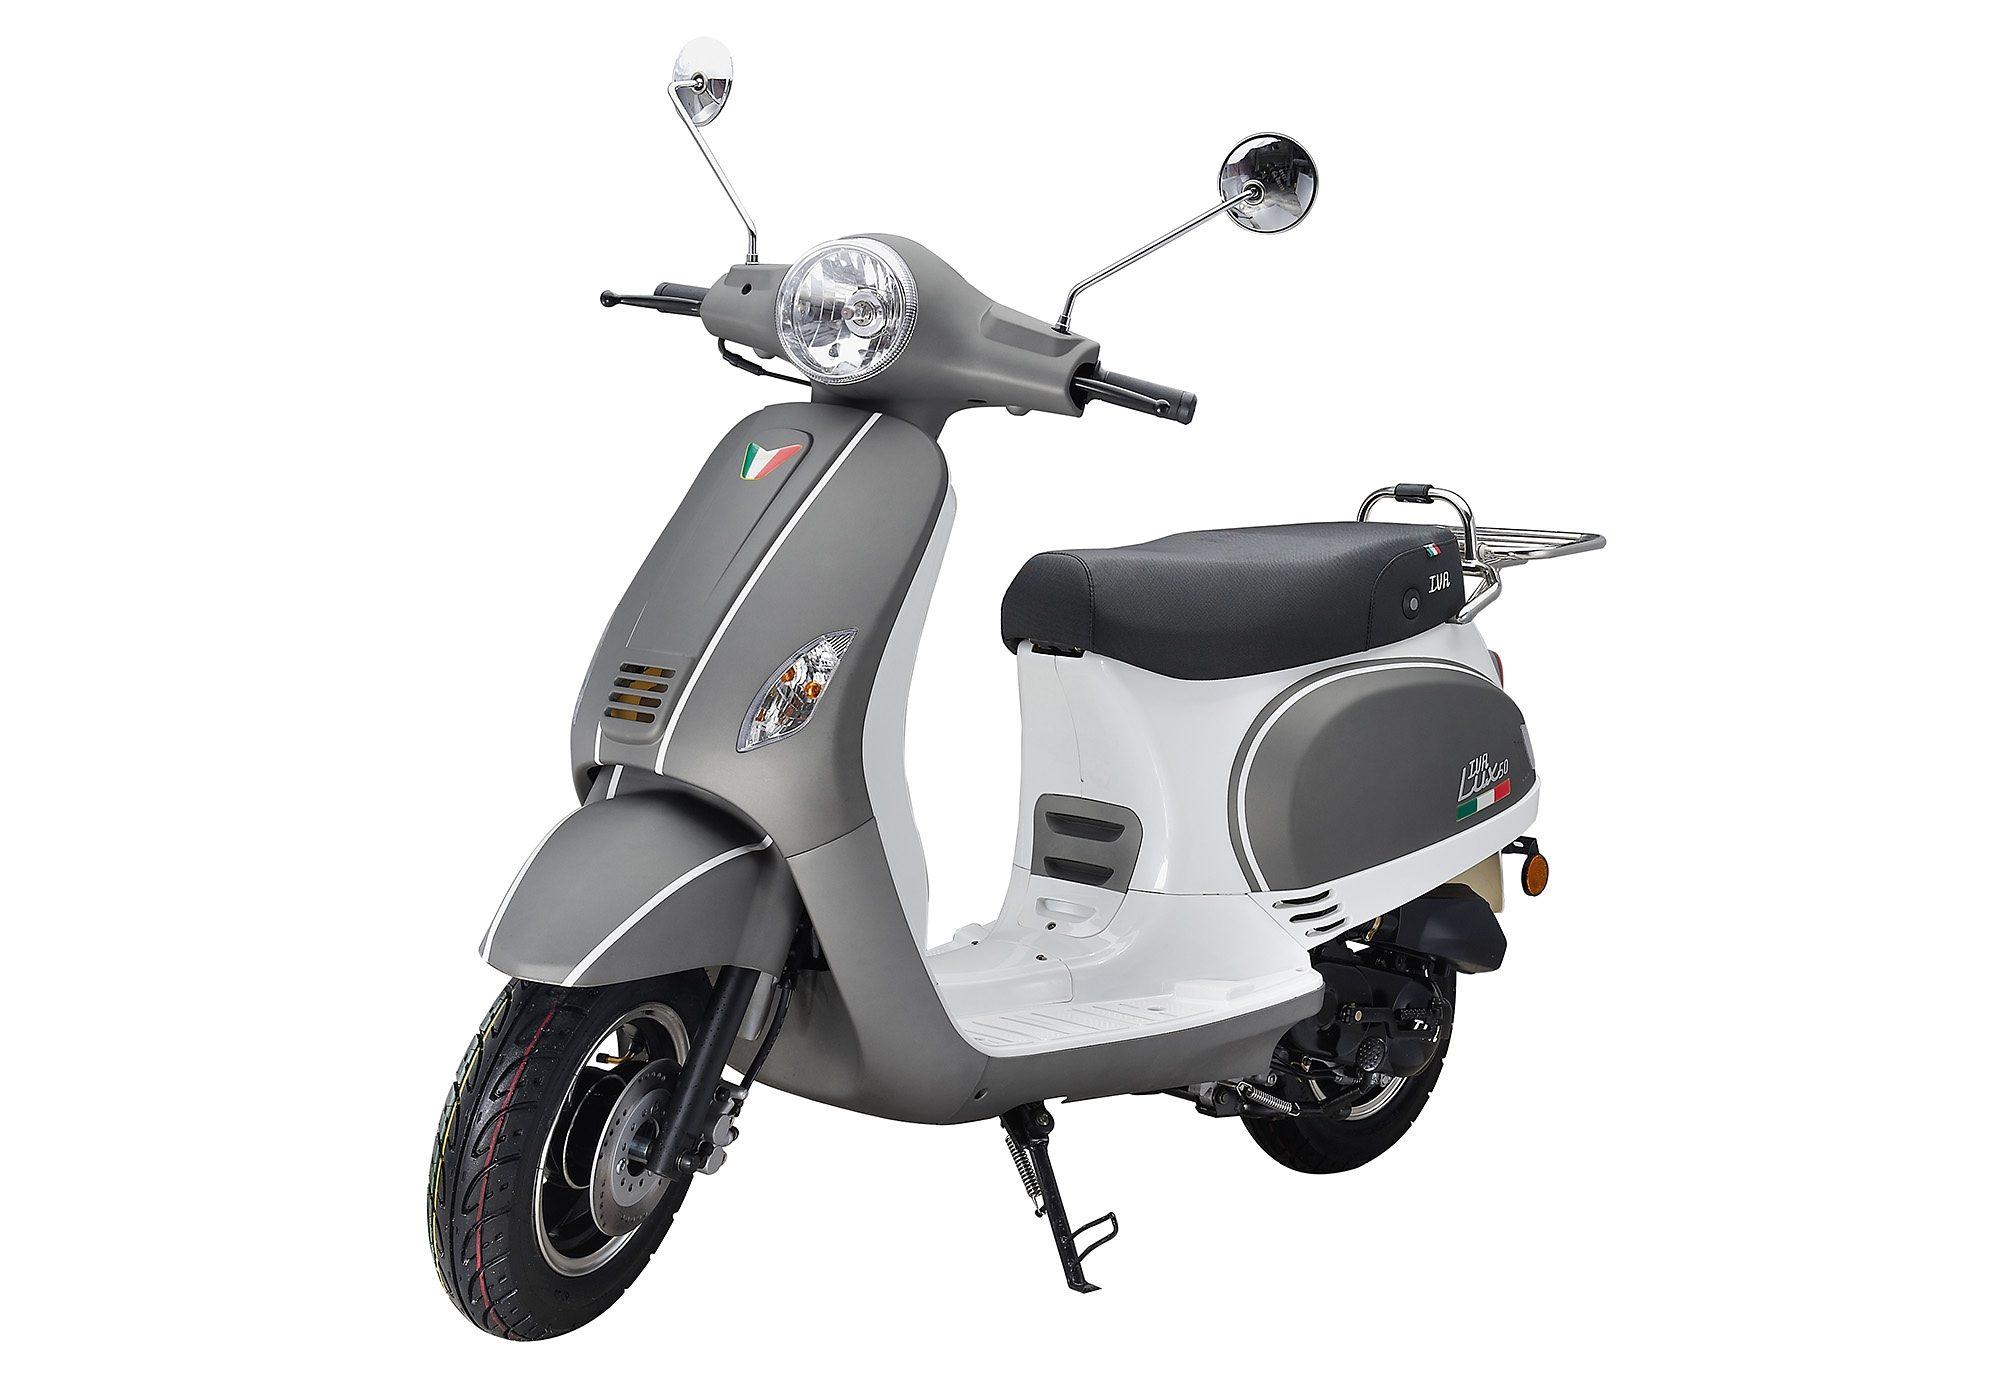 Mofaroller, 50 ccm, 3 PS, 25 km/h, für 1 Person, grau-weiss, »LUX«, IVA